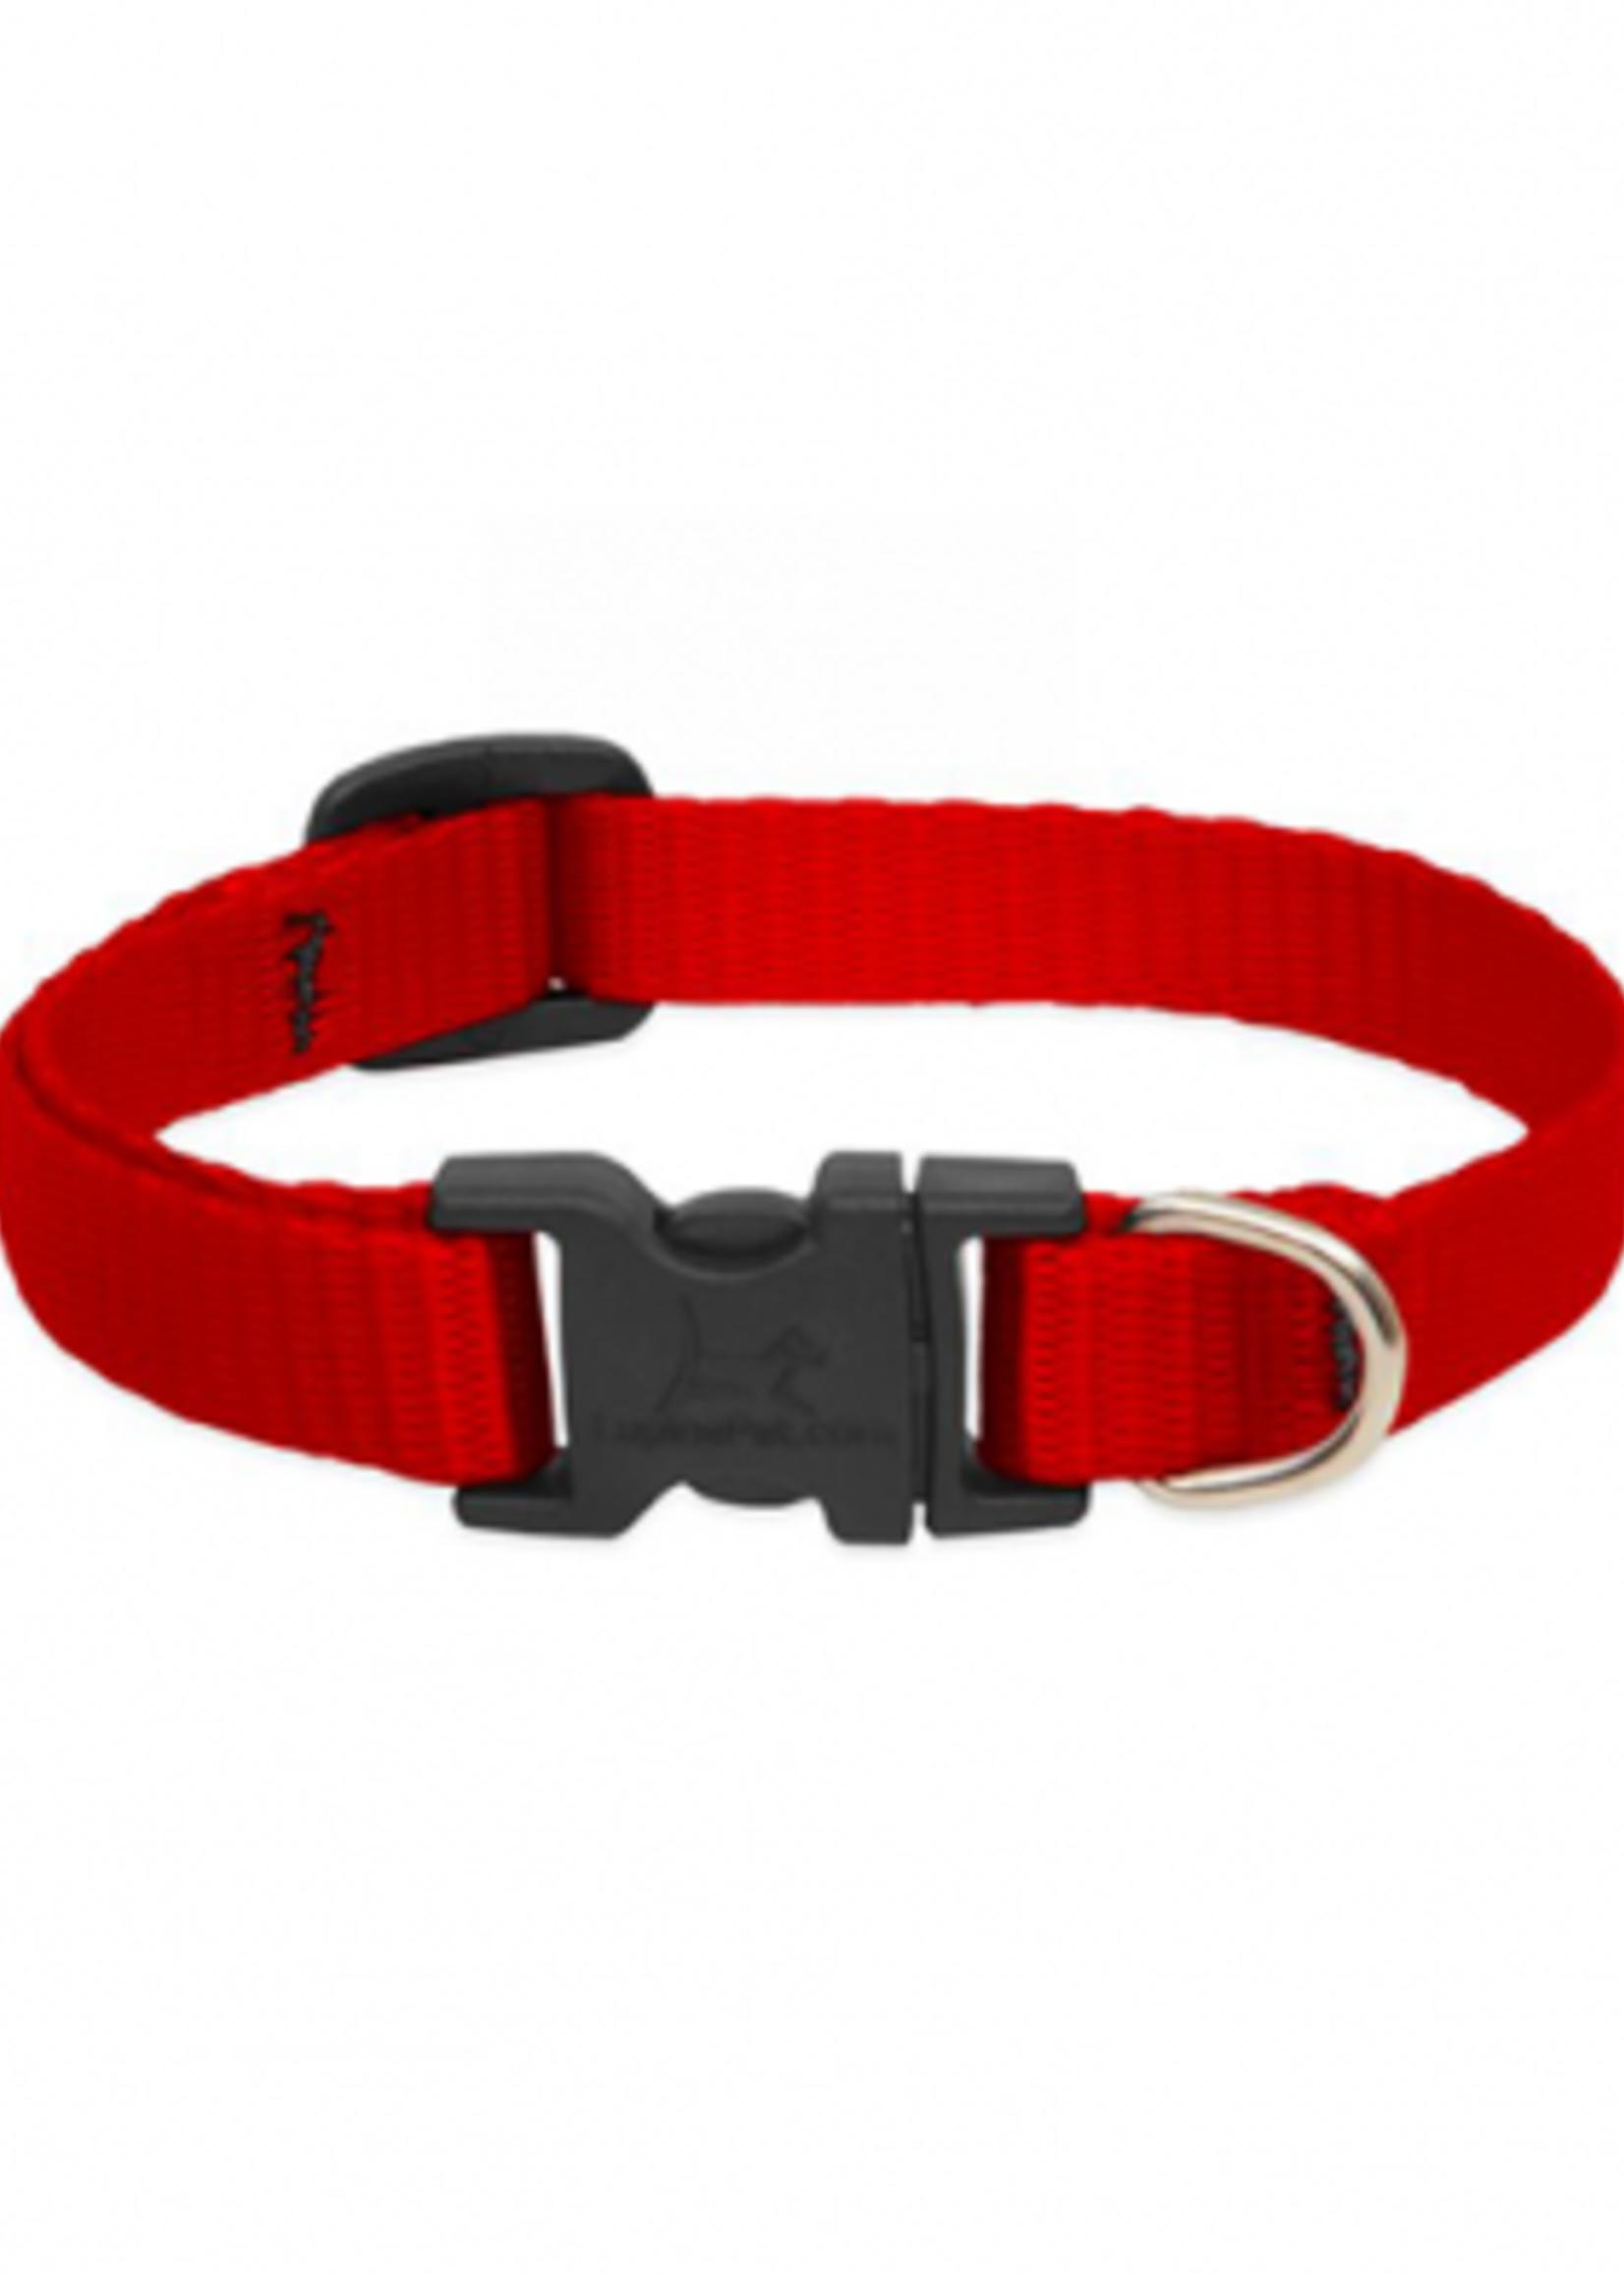 "Lupine® Basics Collar 1/2"" x 8-12"""